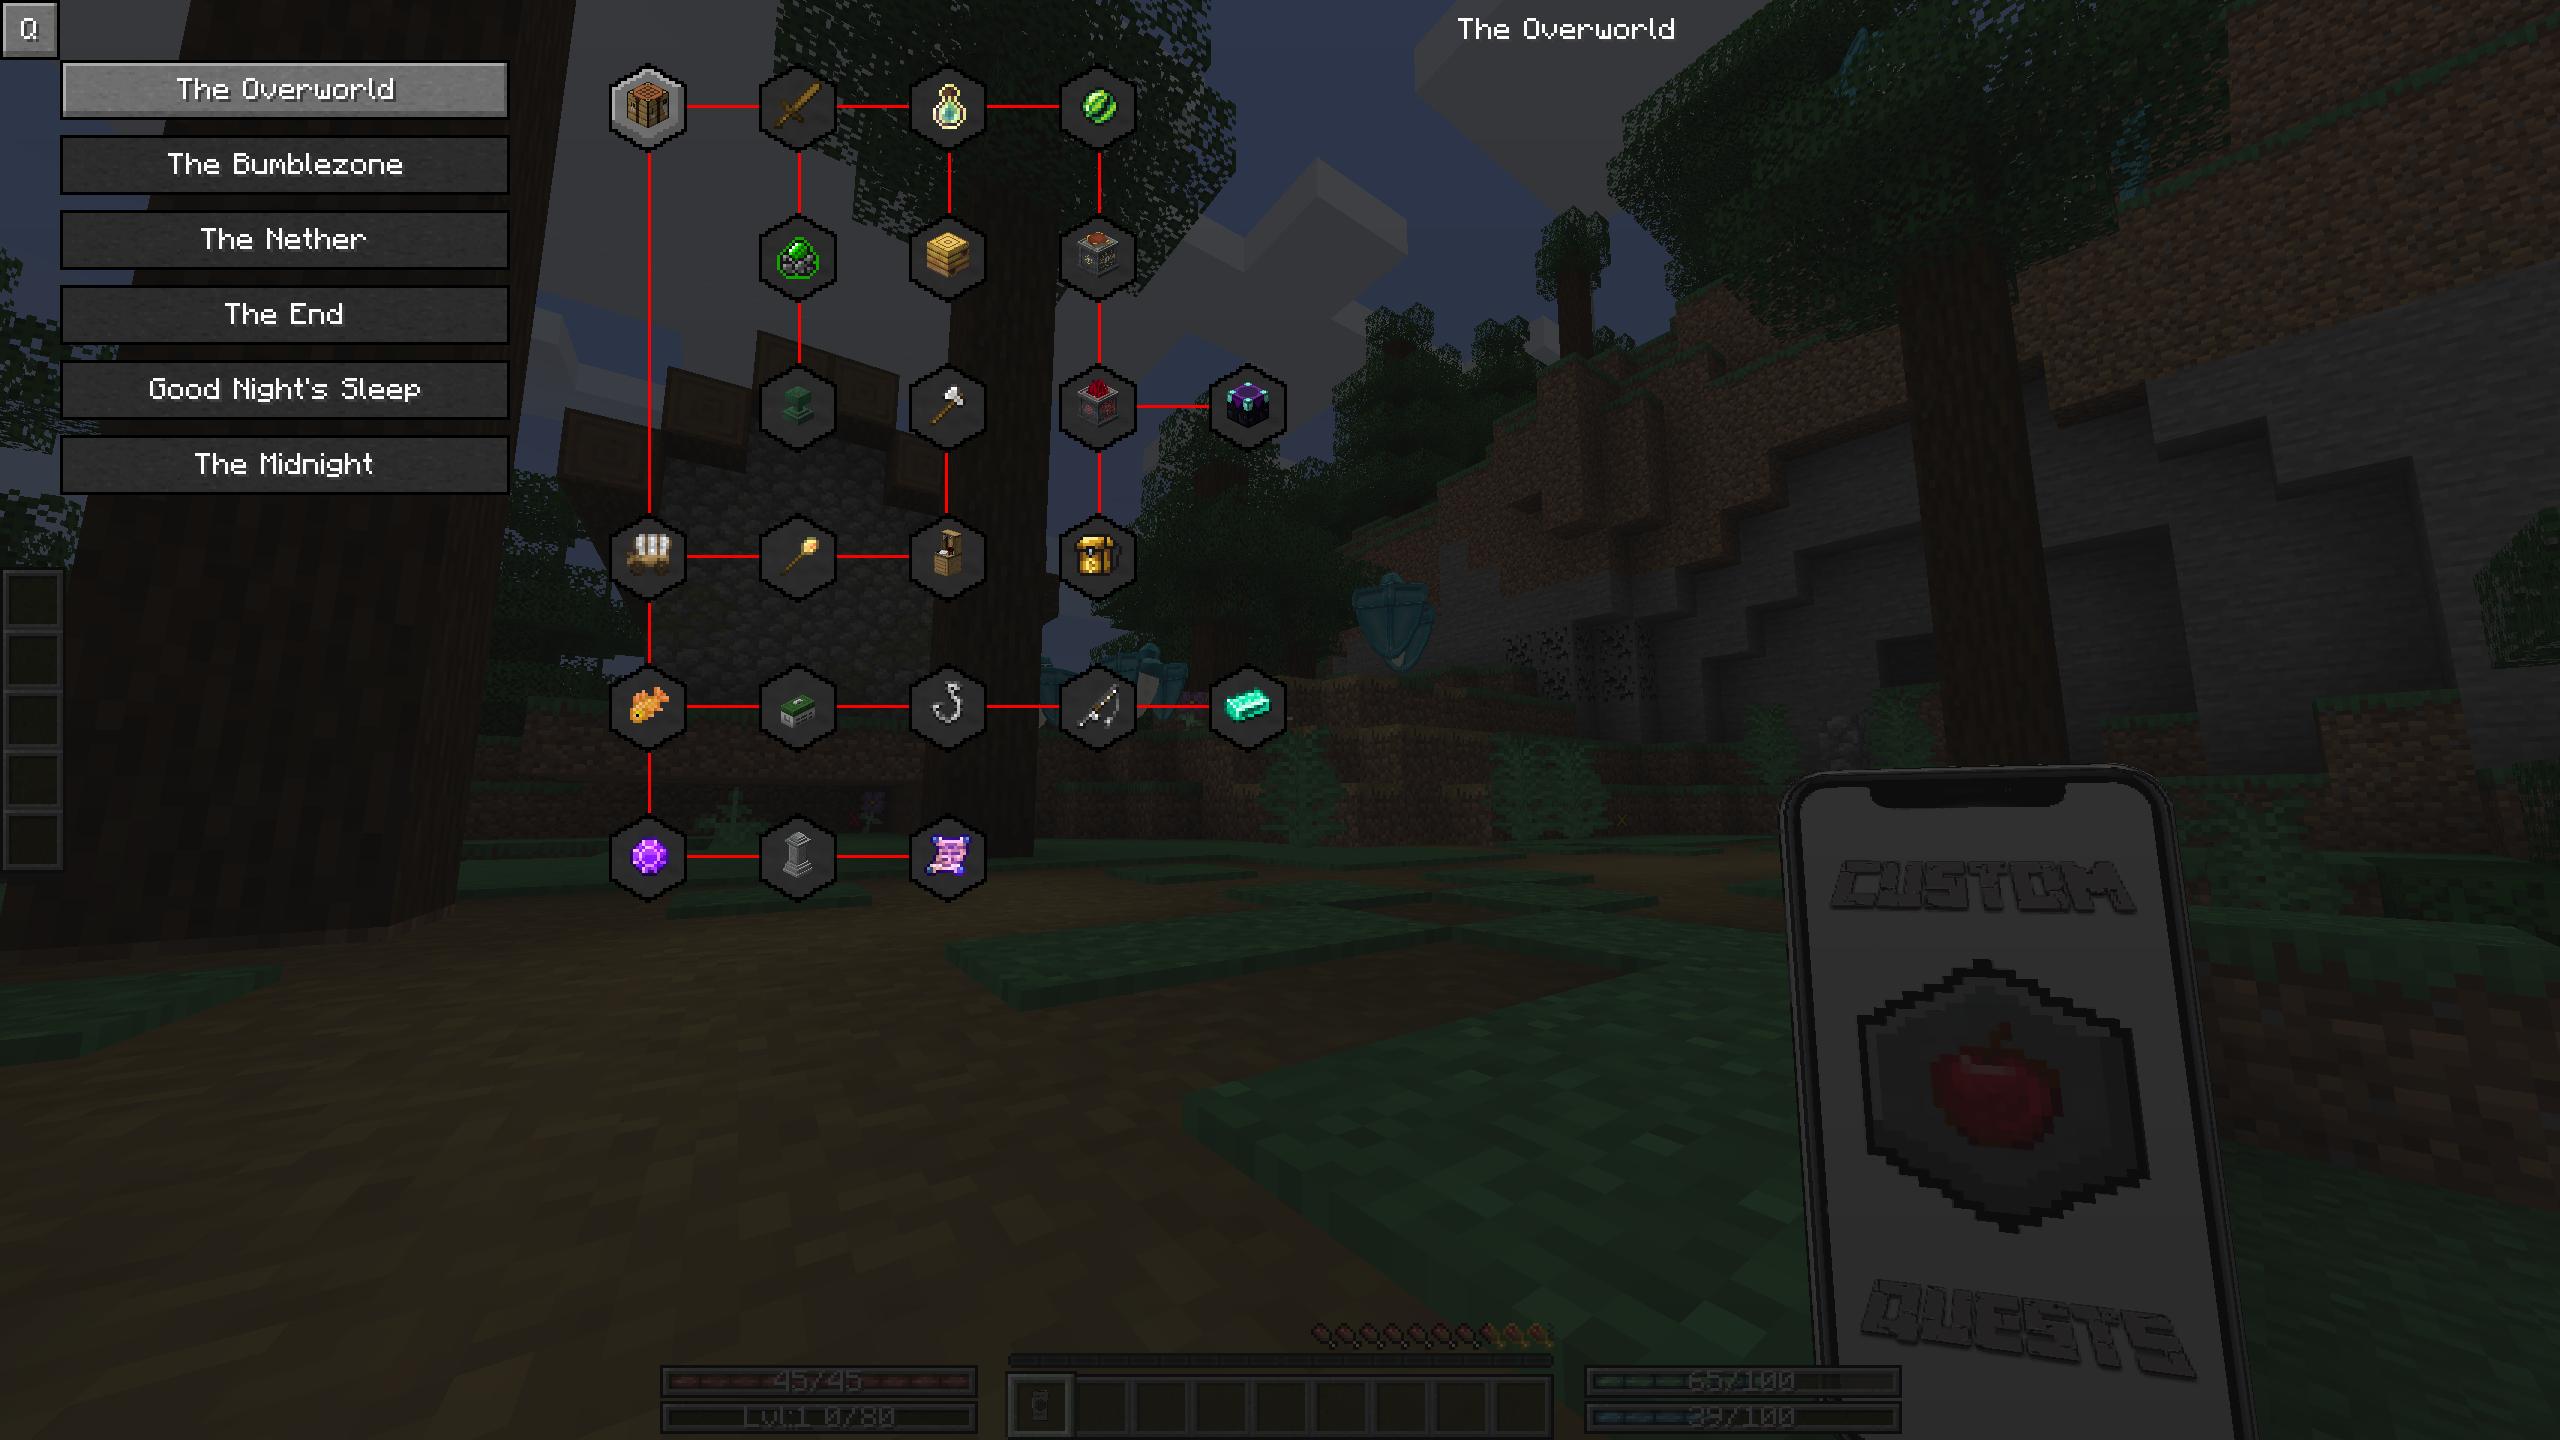 Progression log for the overworld.